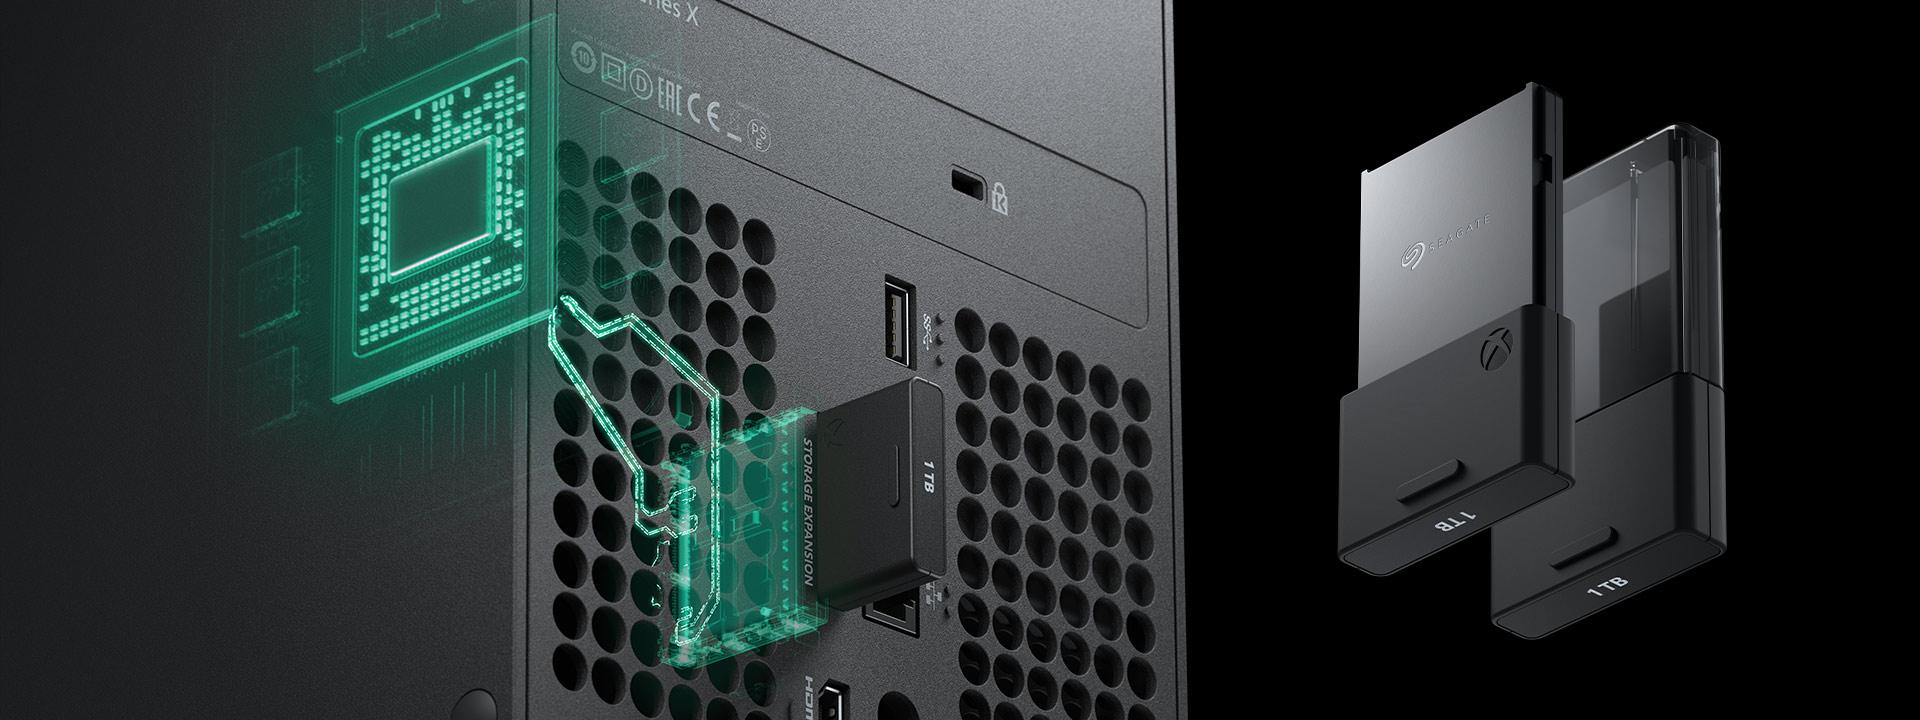 Microsoft Xbox Series X Storage Expansion Card 1 TB